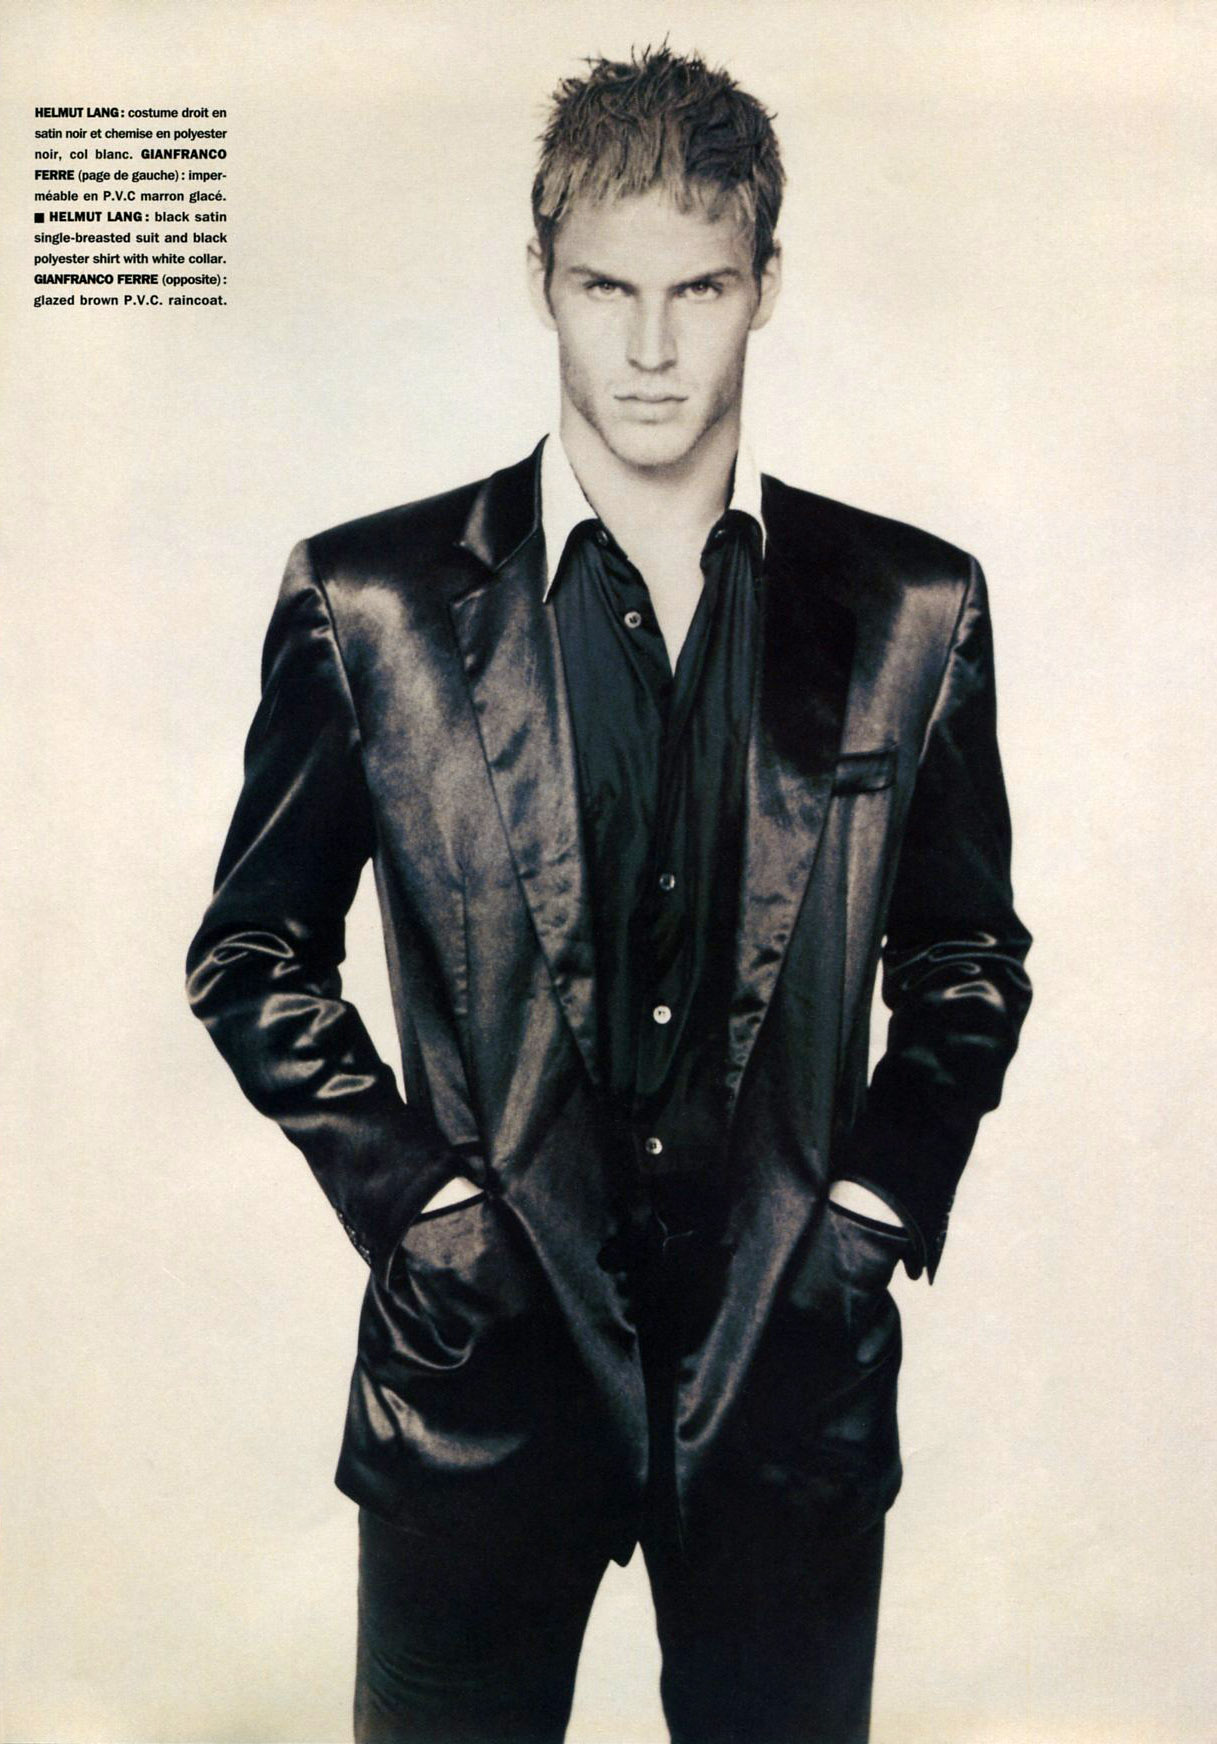 22693_David_Boals_1993_Spring_Vogue_Hommes_International_Fr_Paolo_Roversi_003_122_1064lo.jpg